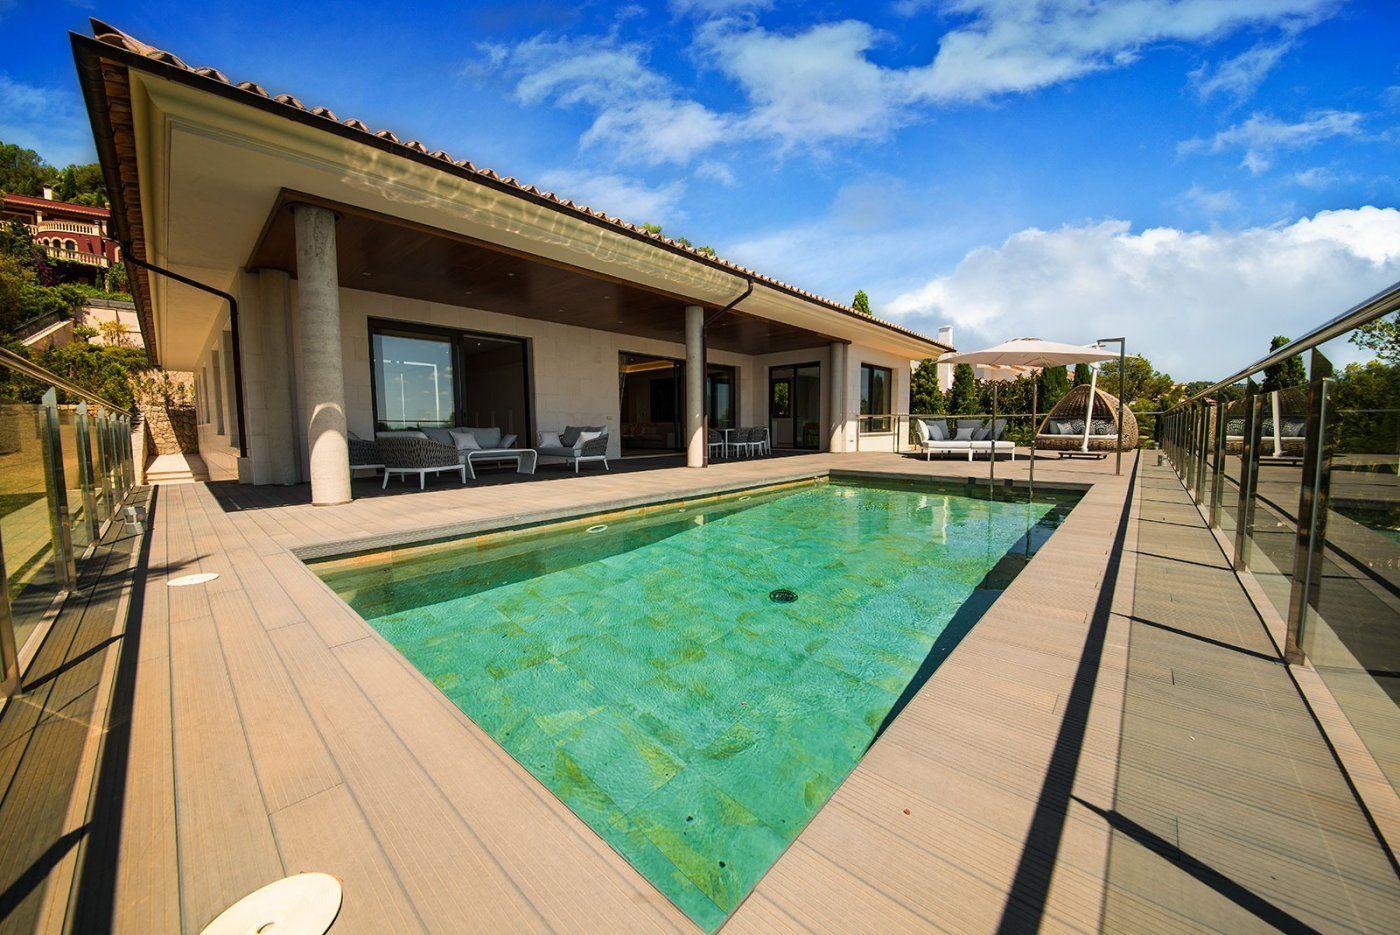 Villa de Lujo en Palma, venta